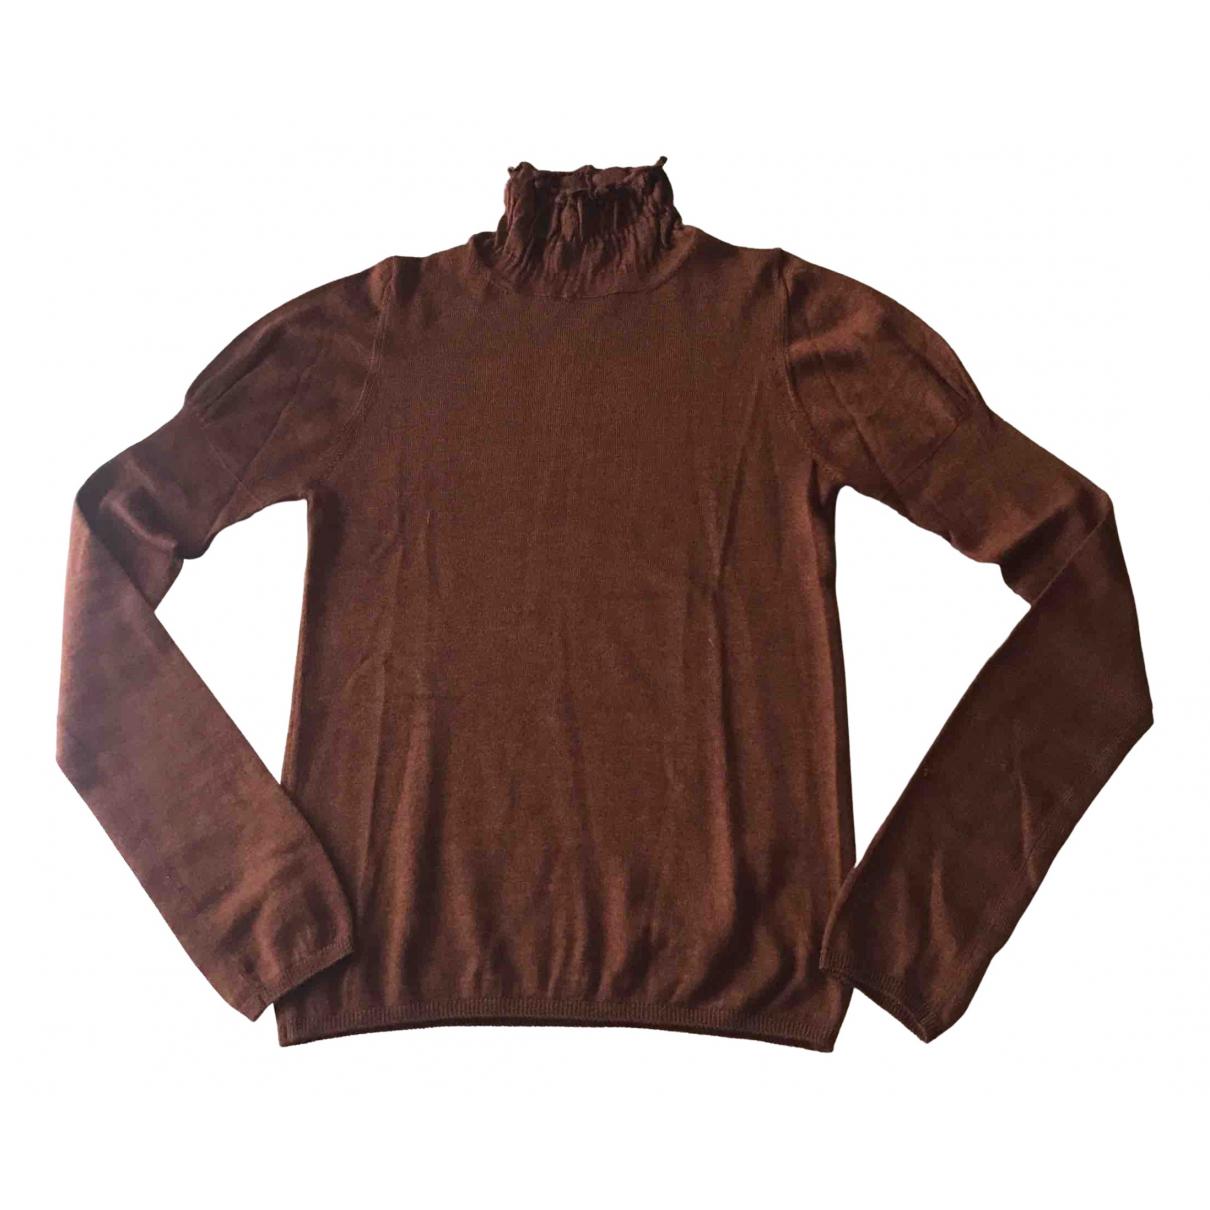 Prada N Brown Cashmere Knitwear for Women 38 IT